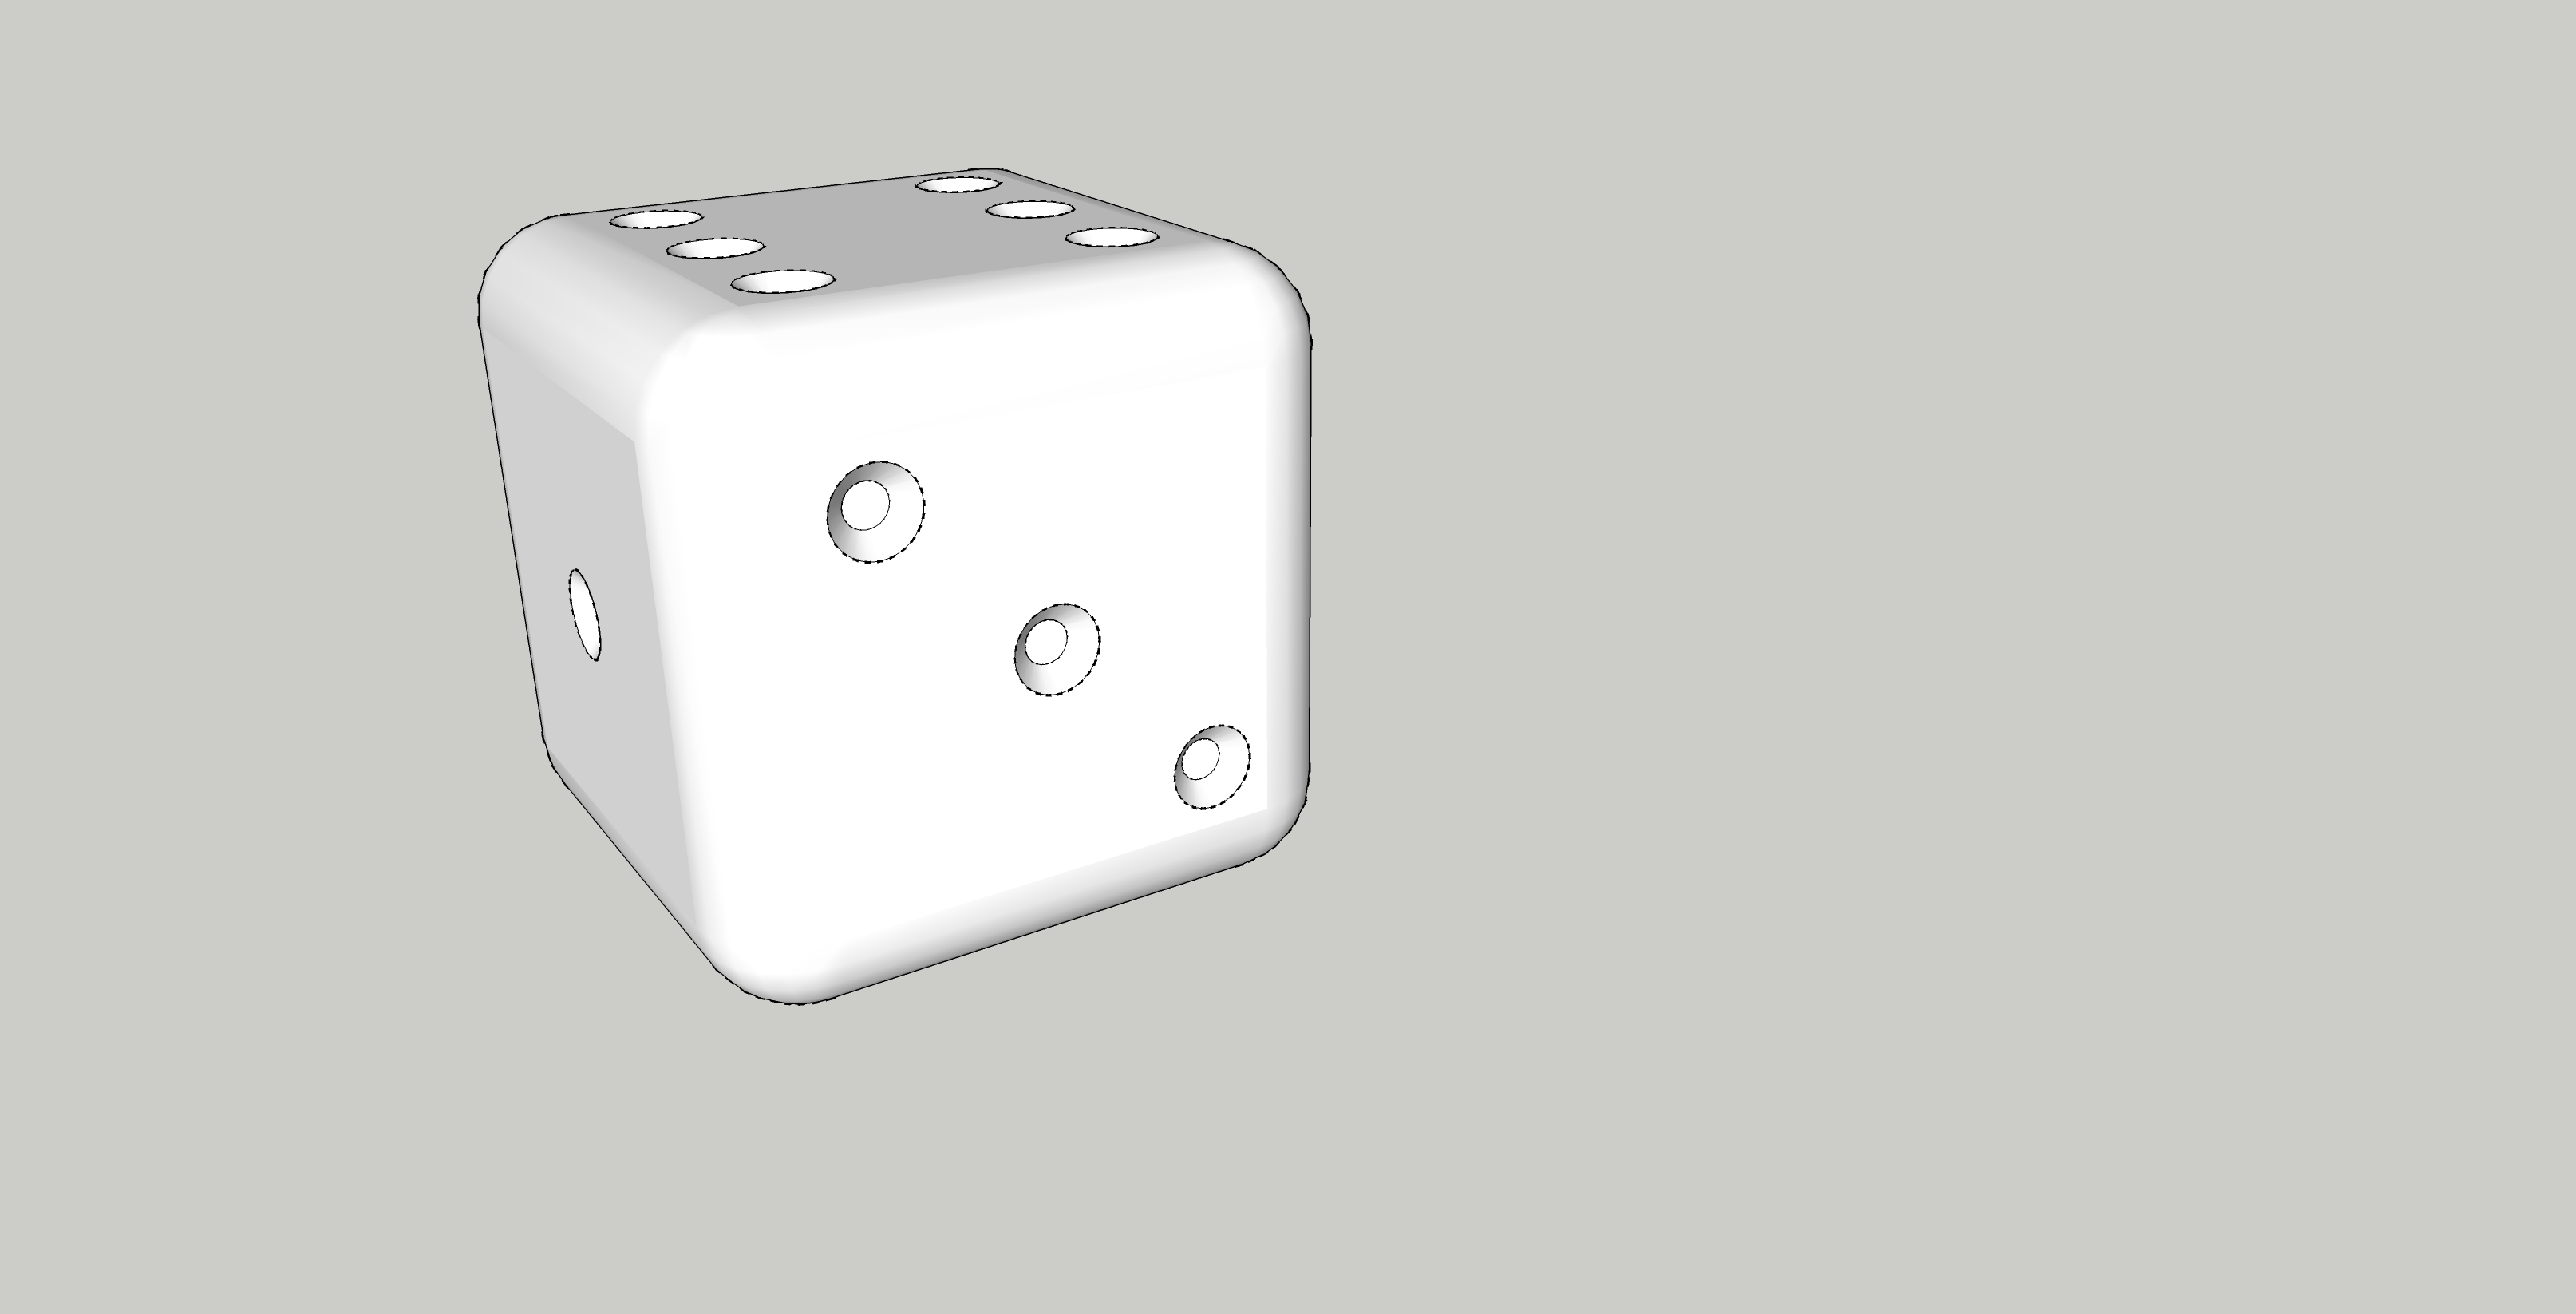 dé.jpg Download free STL file dice, stuffing article • 3D printable model, honorin